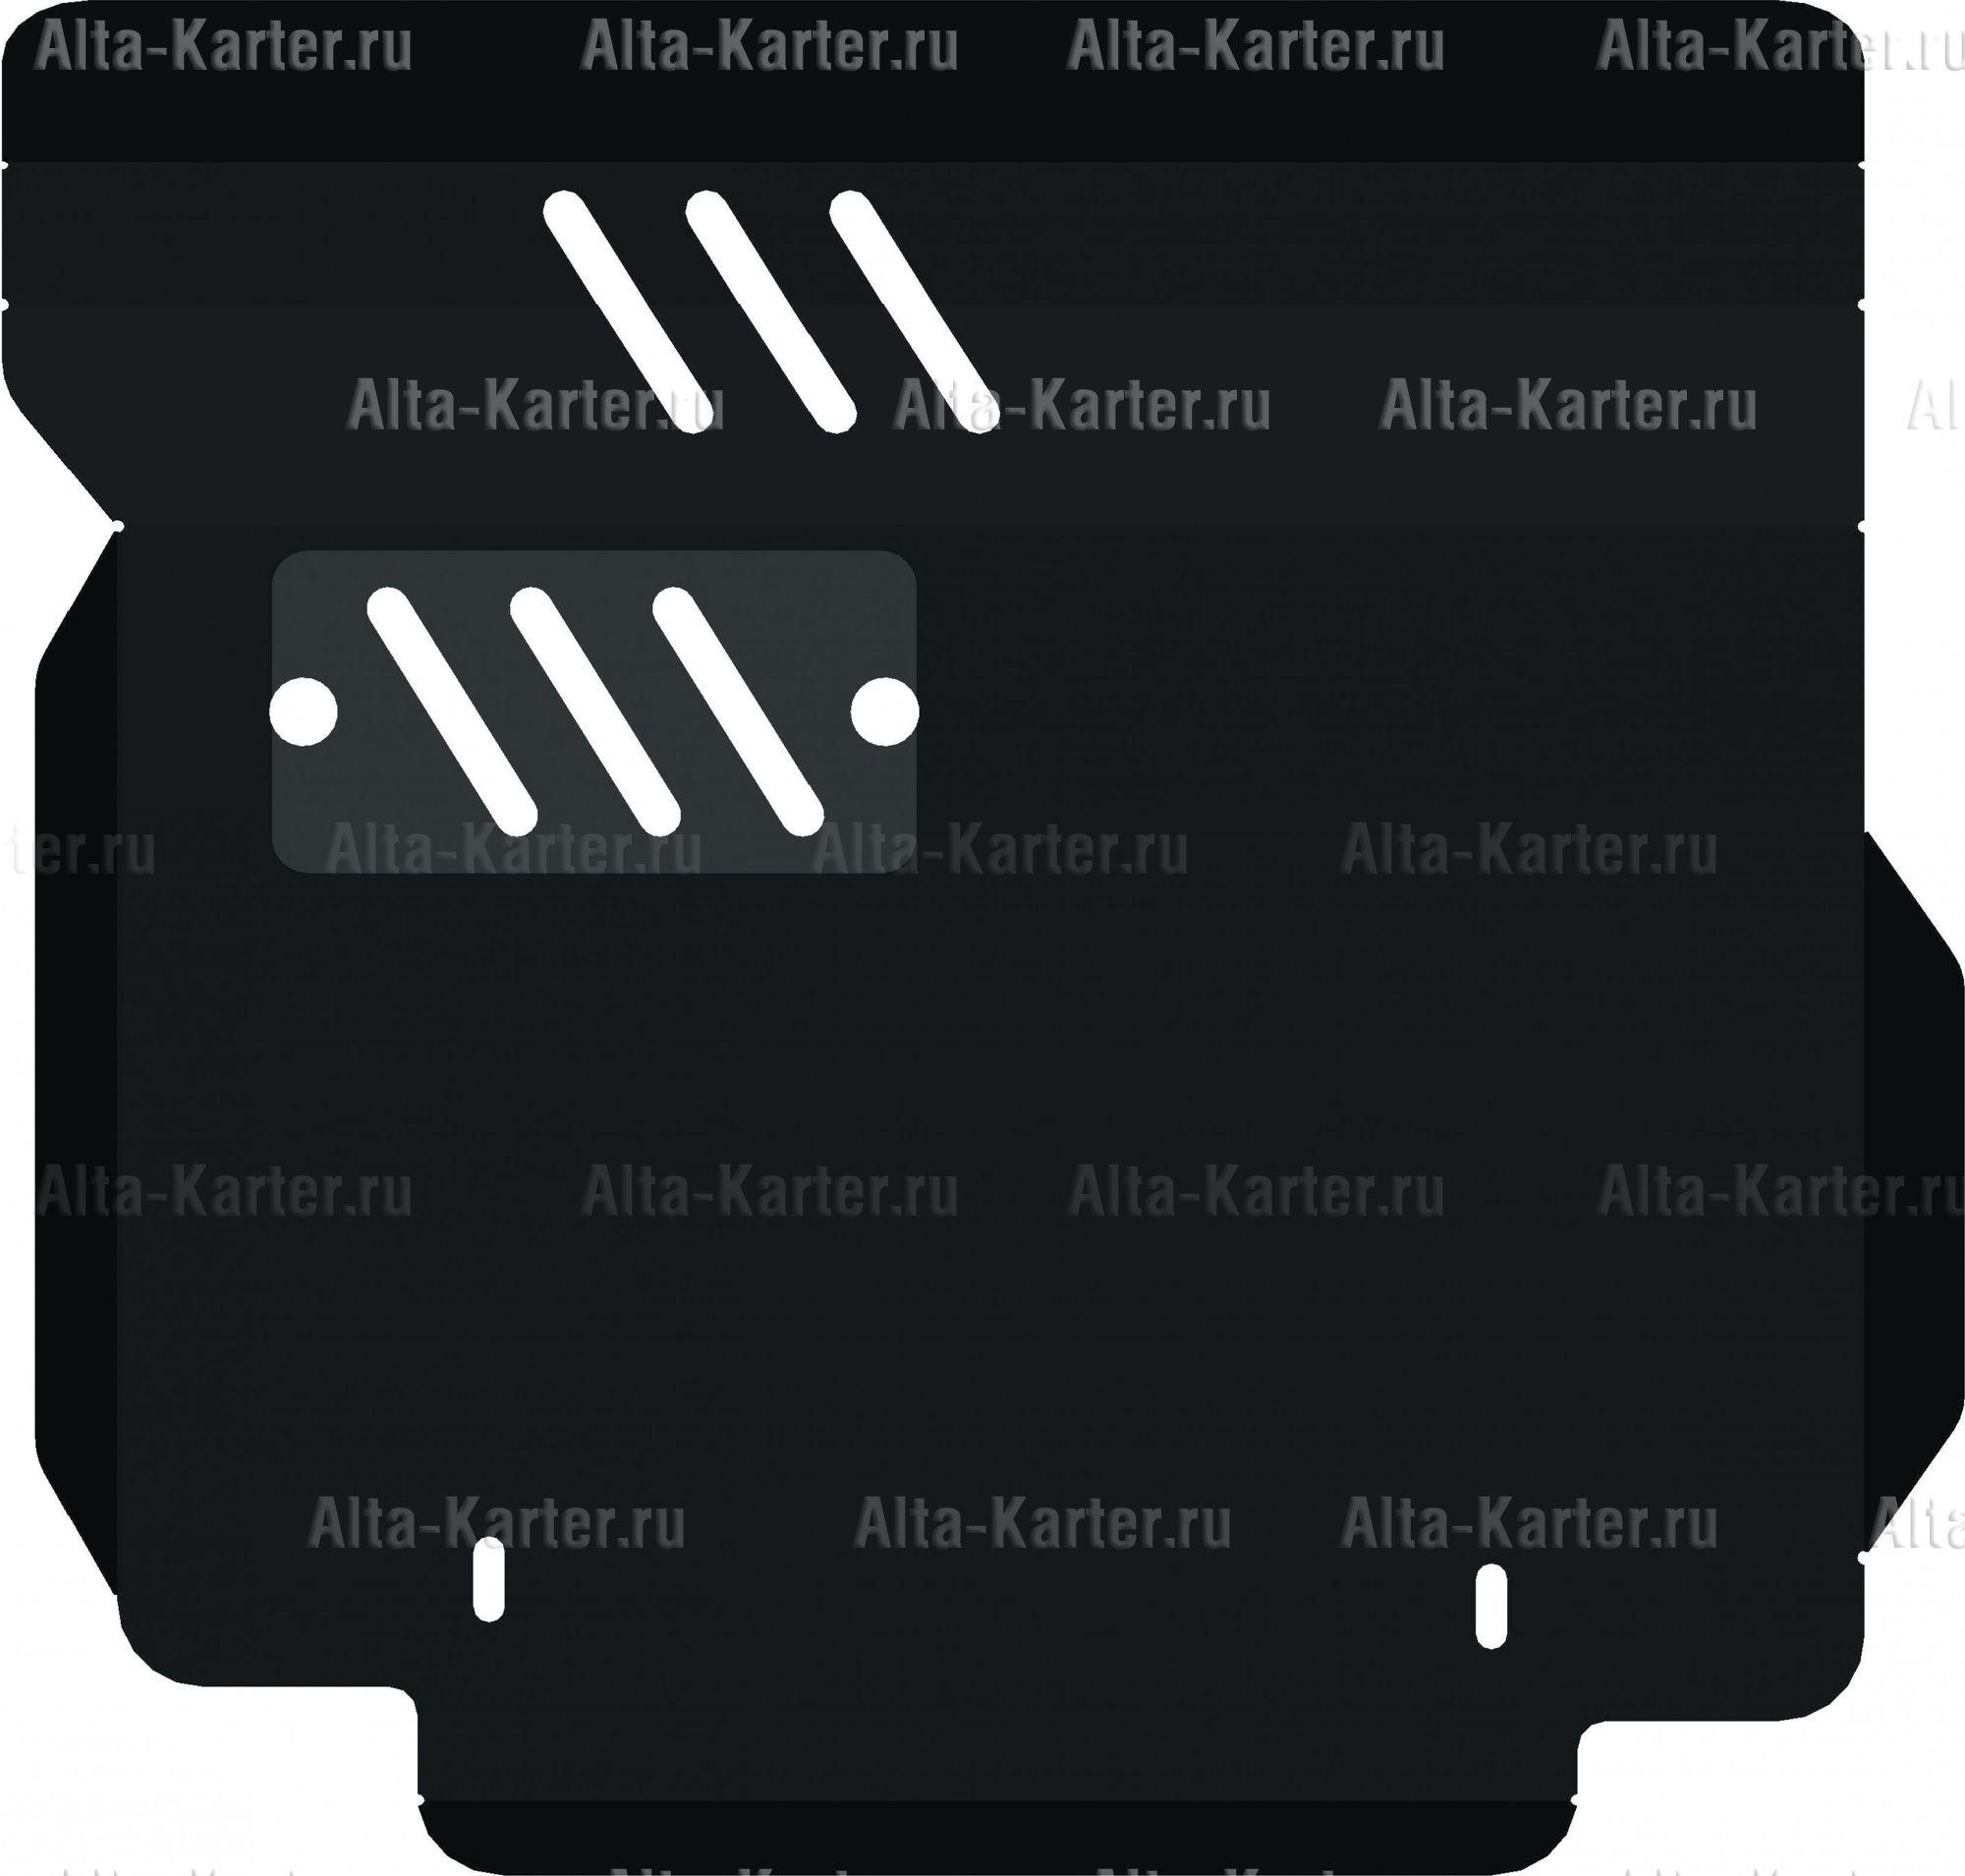 Защита Alfeco для картера и КПП Daihatsu Storia 1998-2005. Артикул ALF.24.80